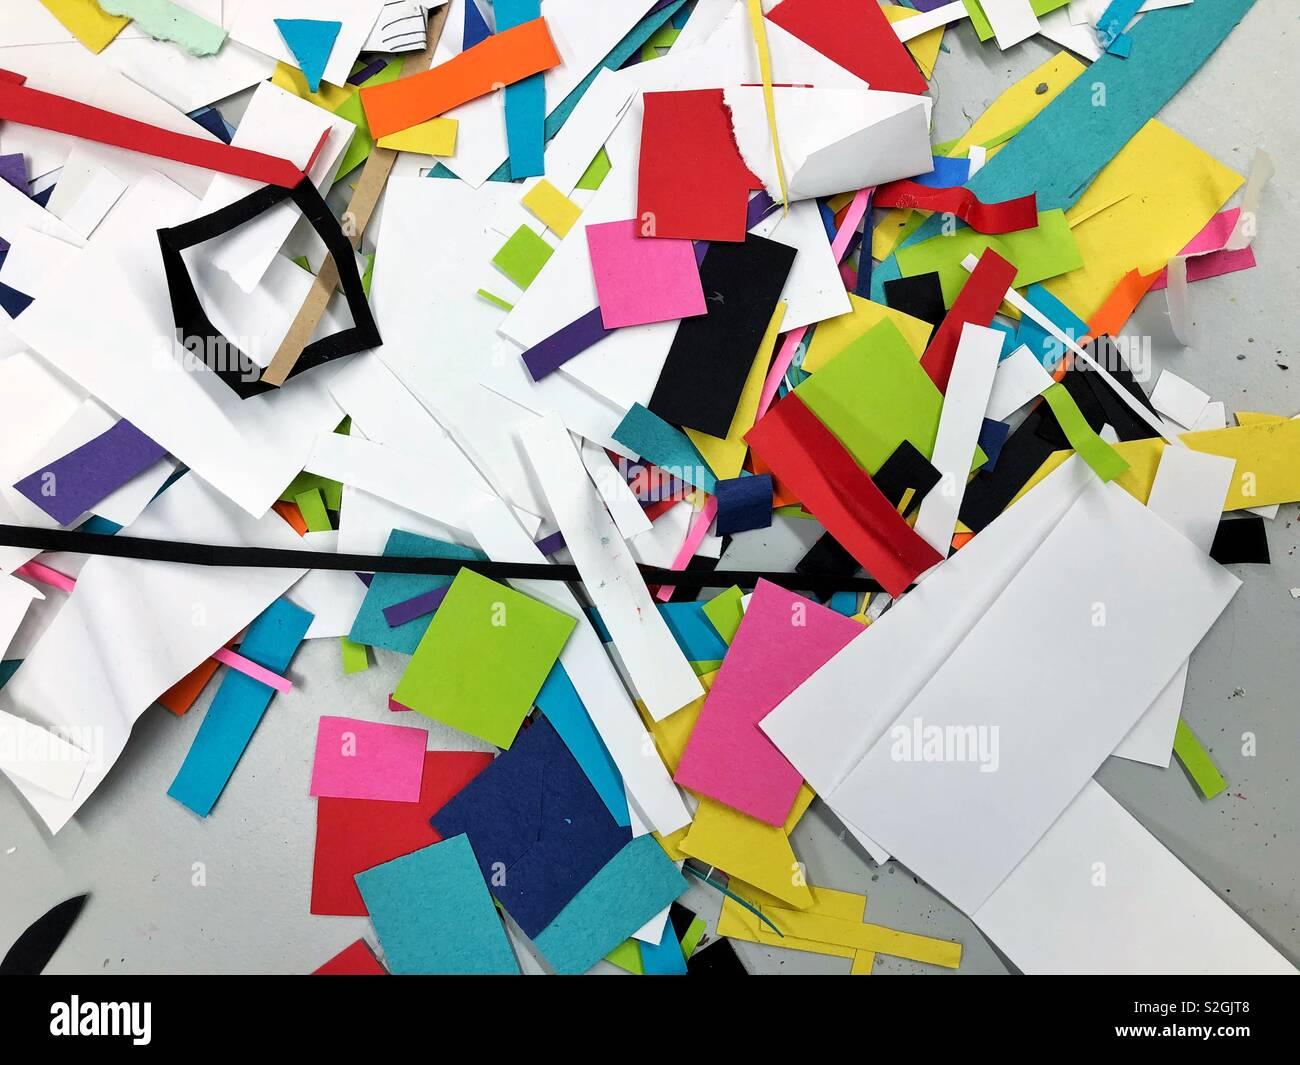 Piles of creative possibilities - Stock Image